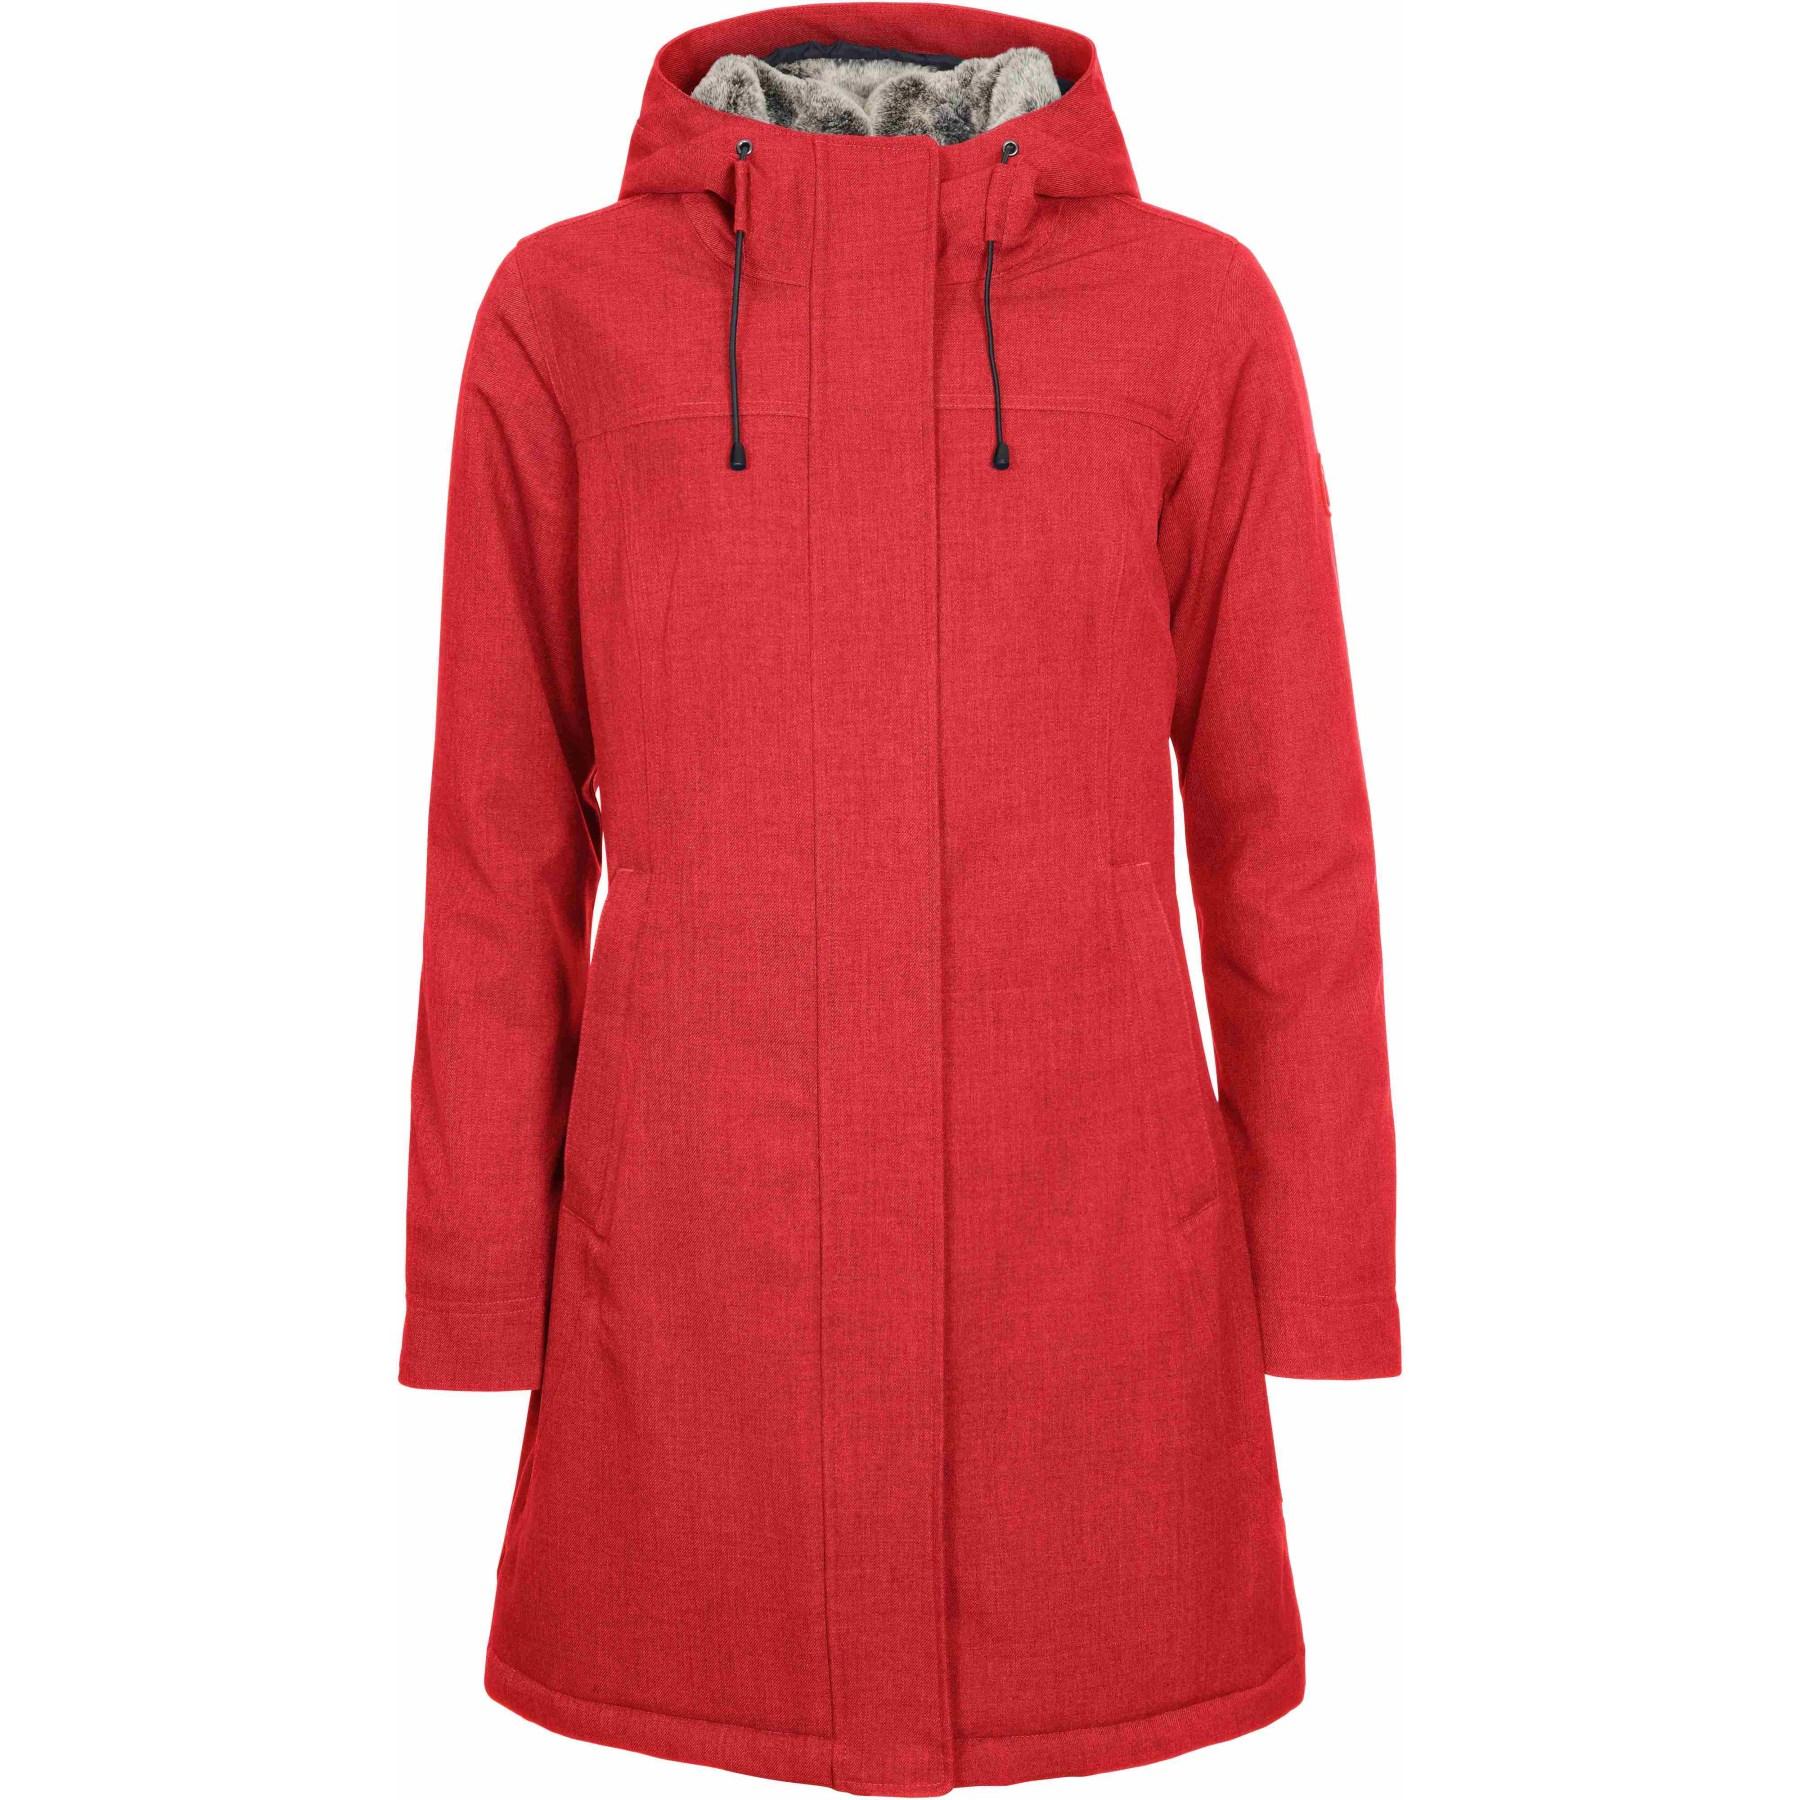 Elkline APRES SKI Womens Waterproof Outdoor Coat - rioredmelange